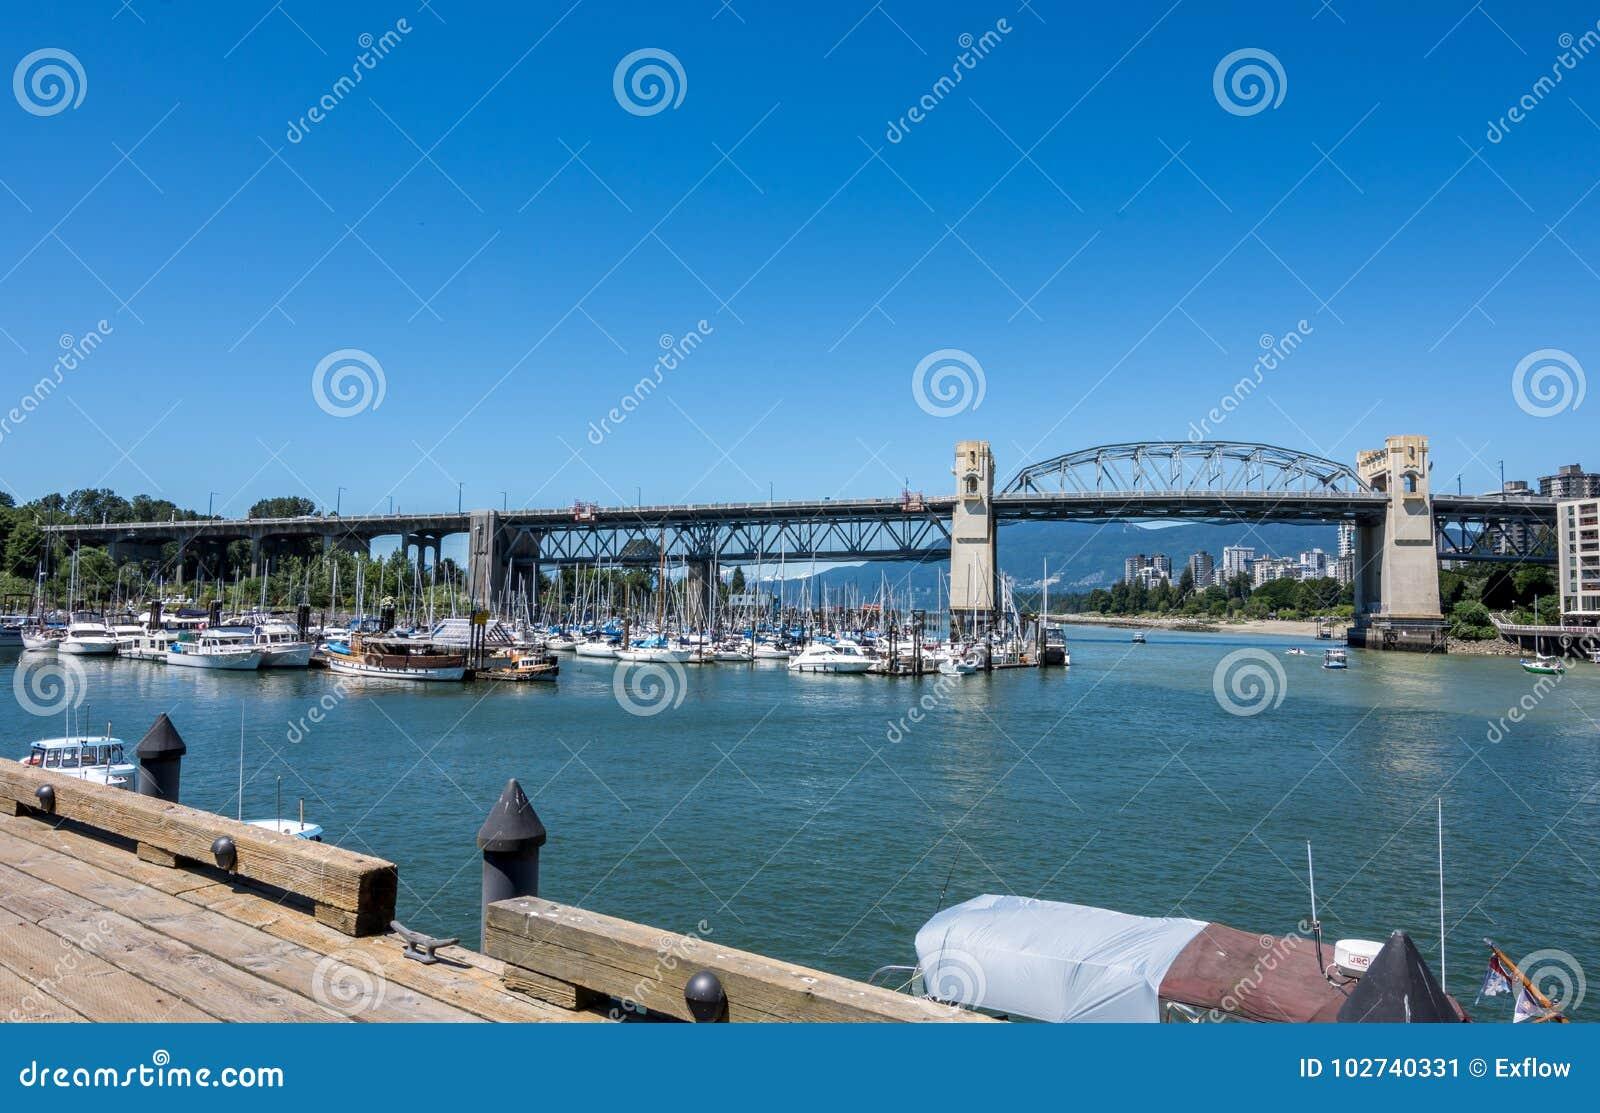 Vancouver, Canada - June 23, 2017: Boats in the Burrard Civic Ma